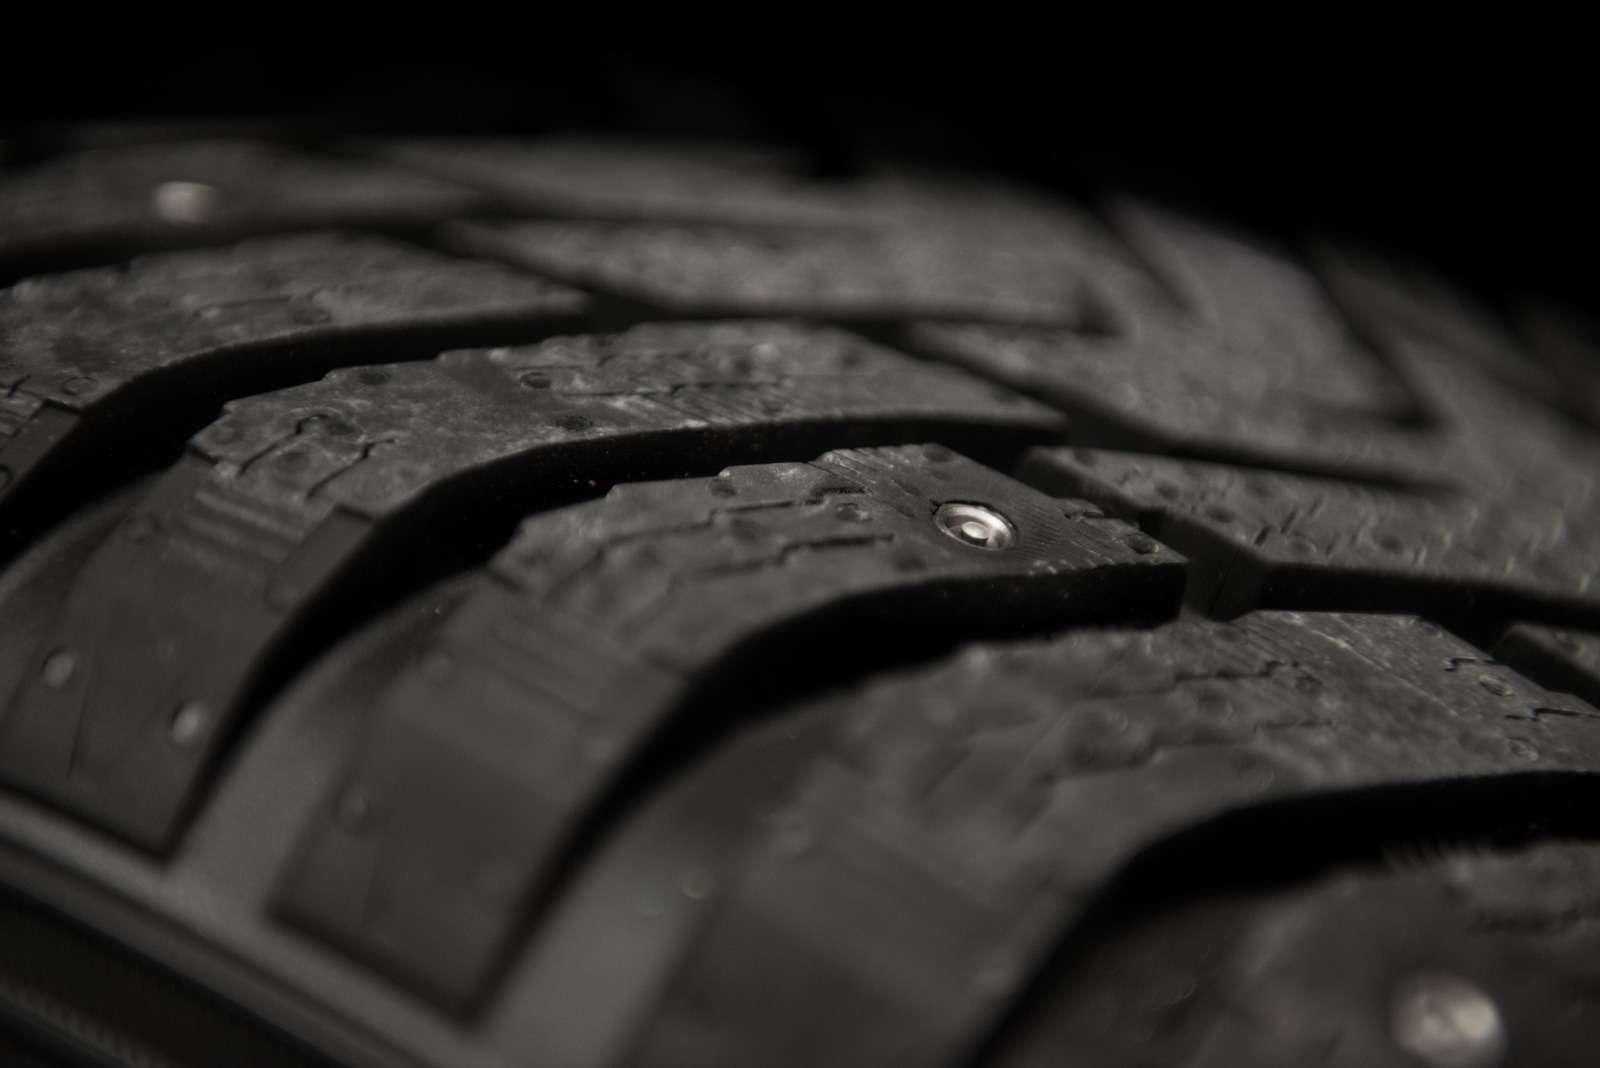 Non-studded_Nokian_Hakkapeliitta_concept_tyre_2_2014_новый размер